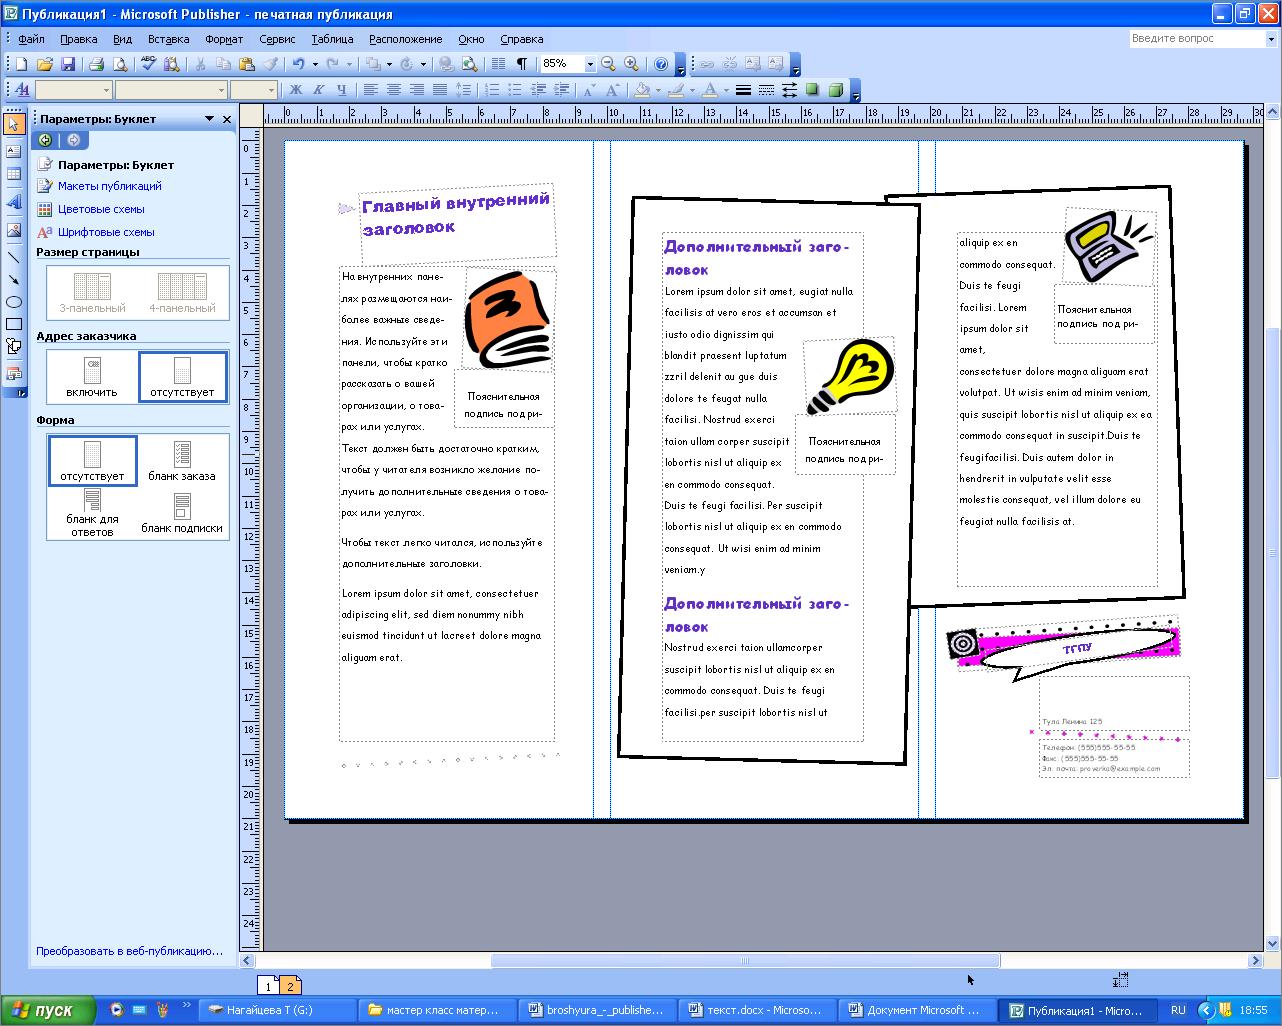 C:\Users\Андрей\Desktop\4.png